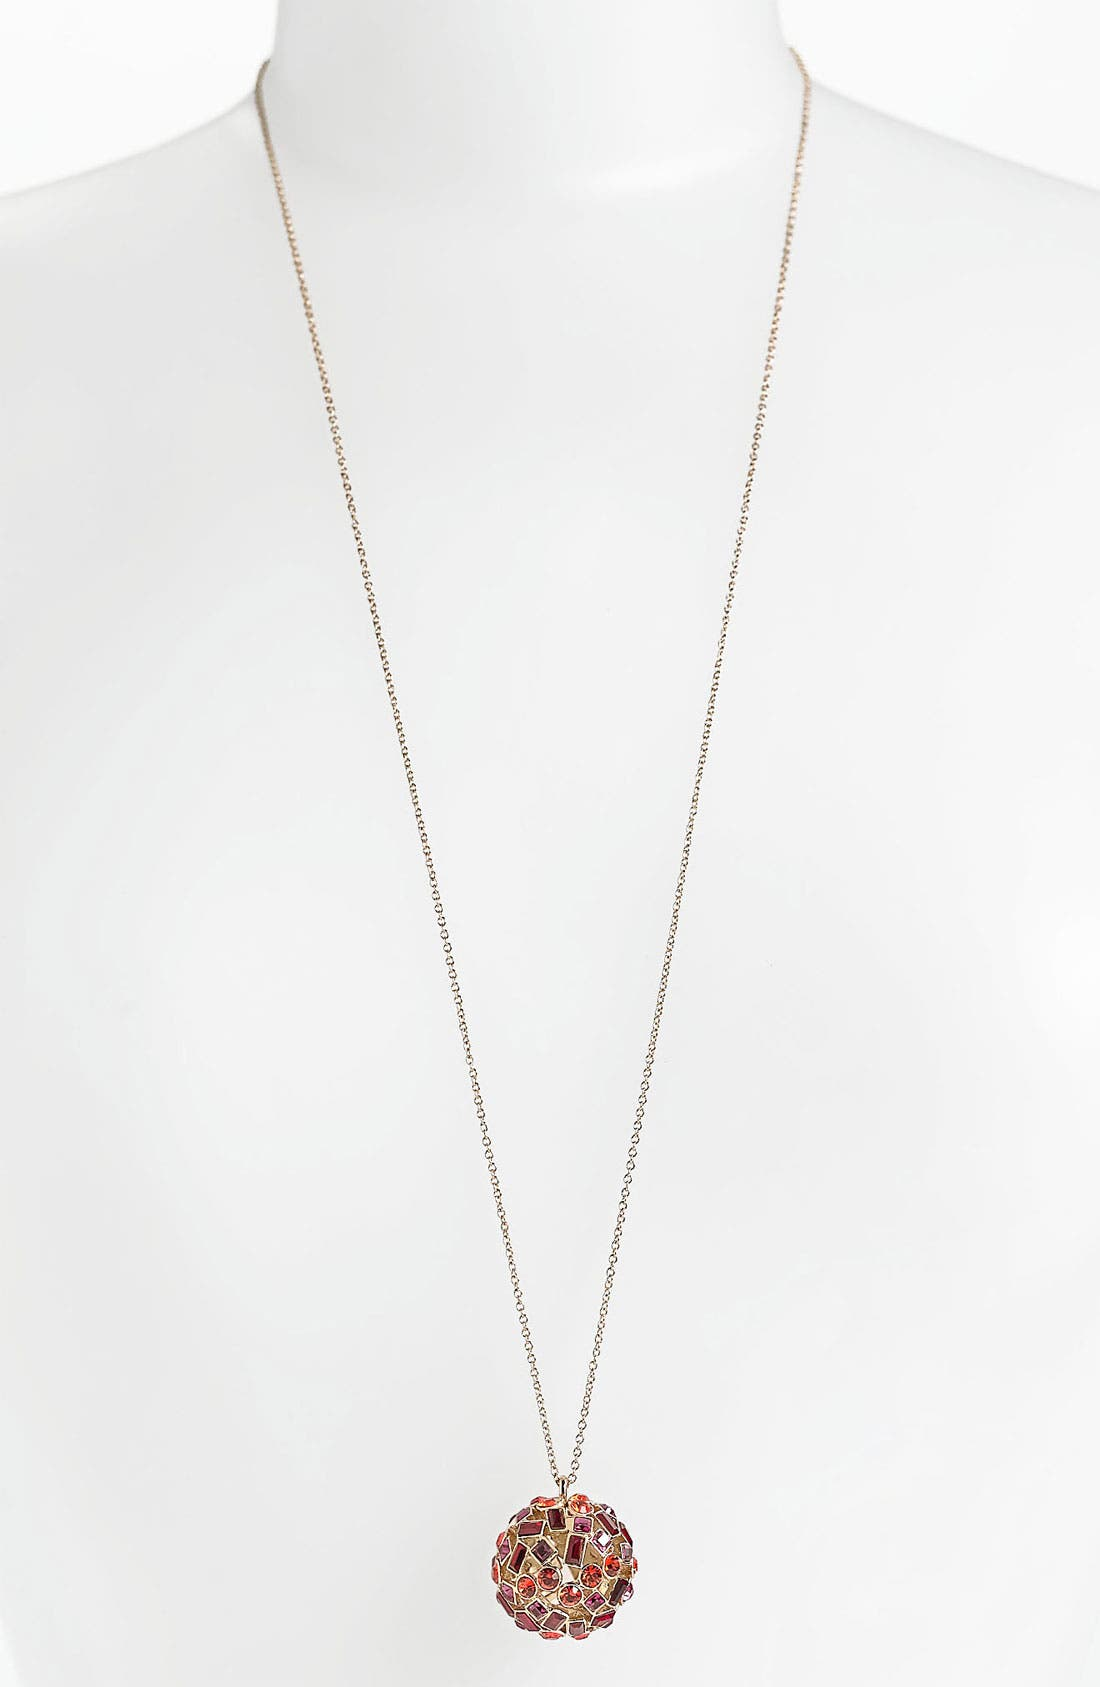 Alternate Image 1 Selected - kate spade new york 'kaleidoball' pendant necklace